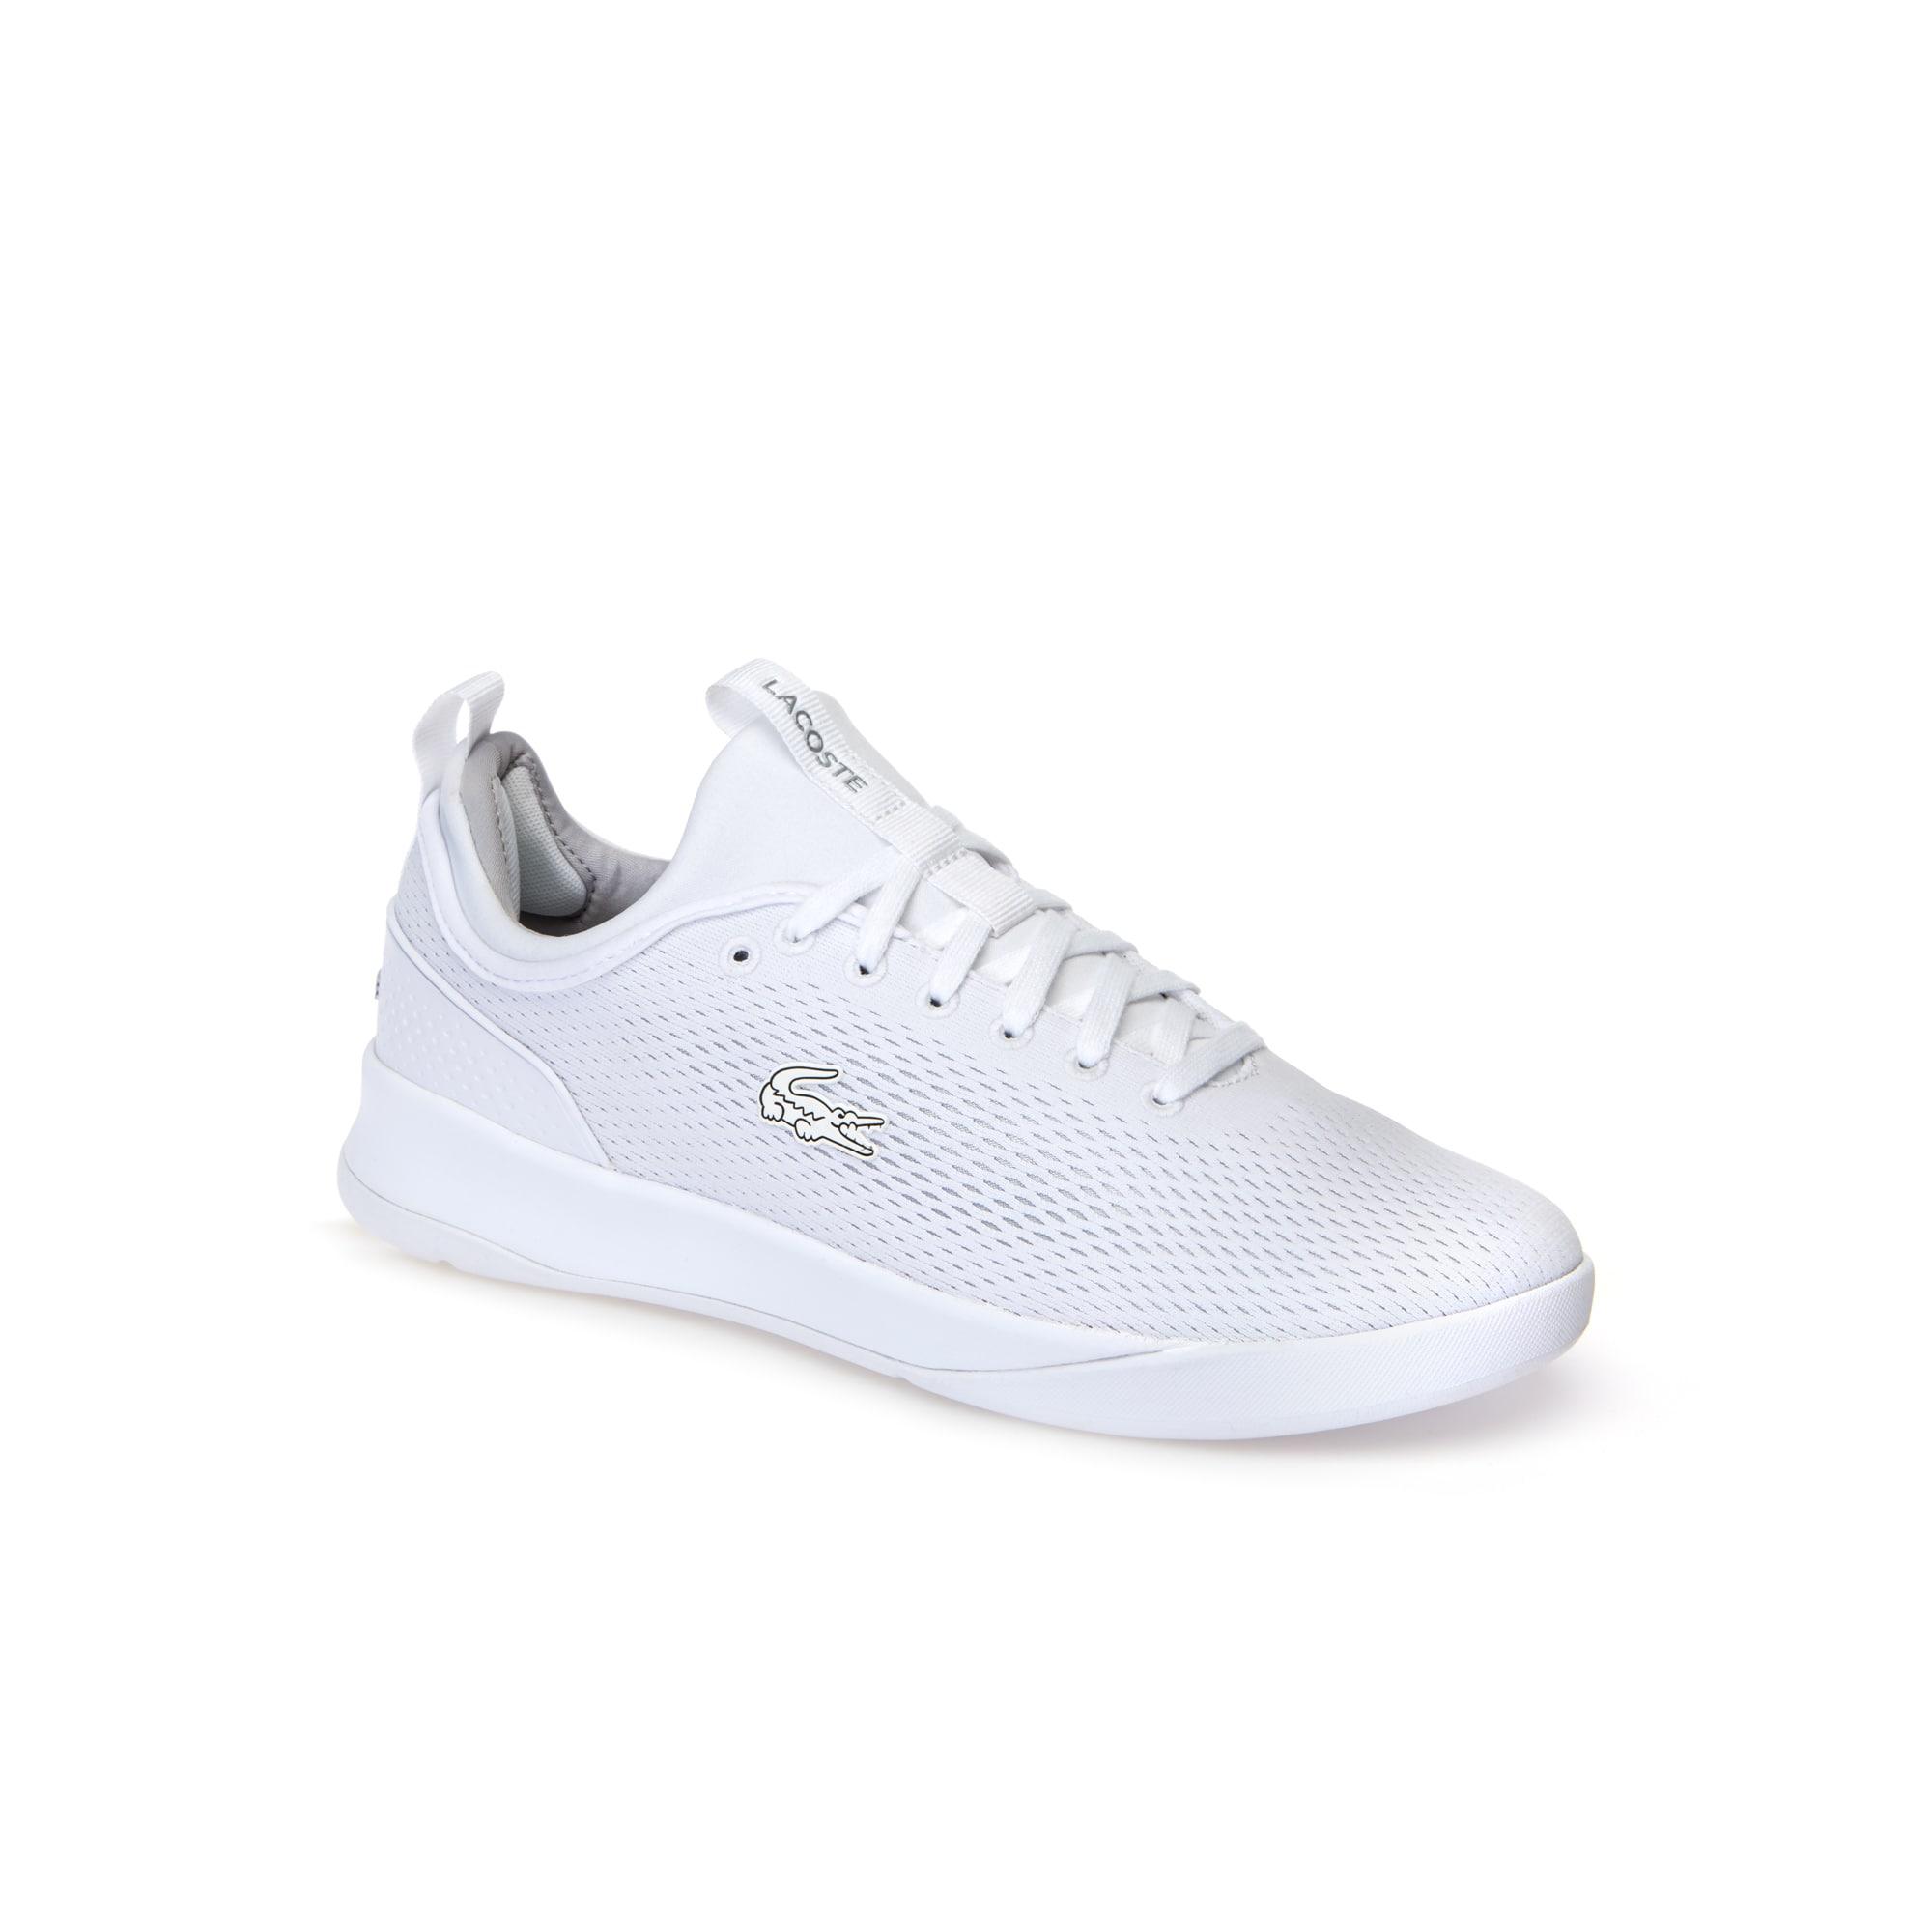 45aa410c7 Calçados masculinos Lacoste  Sneakers